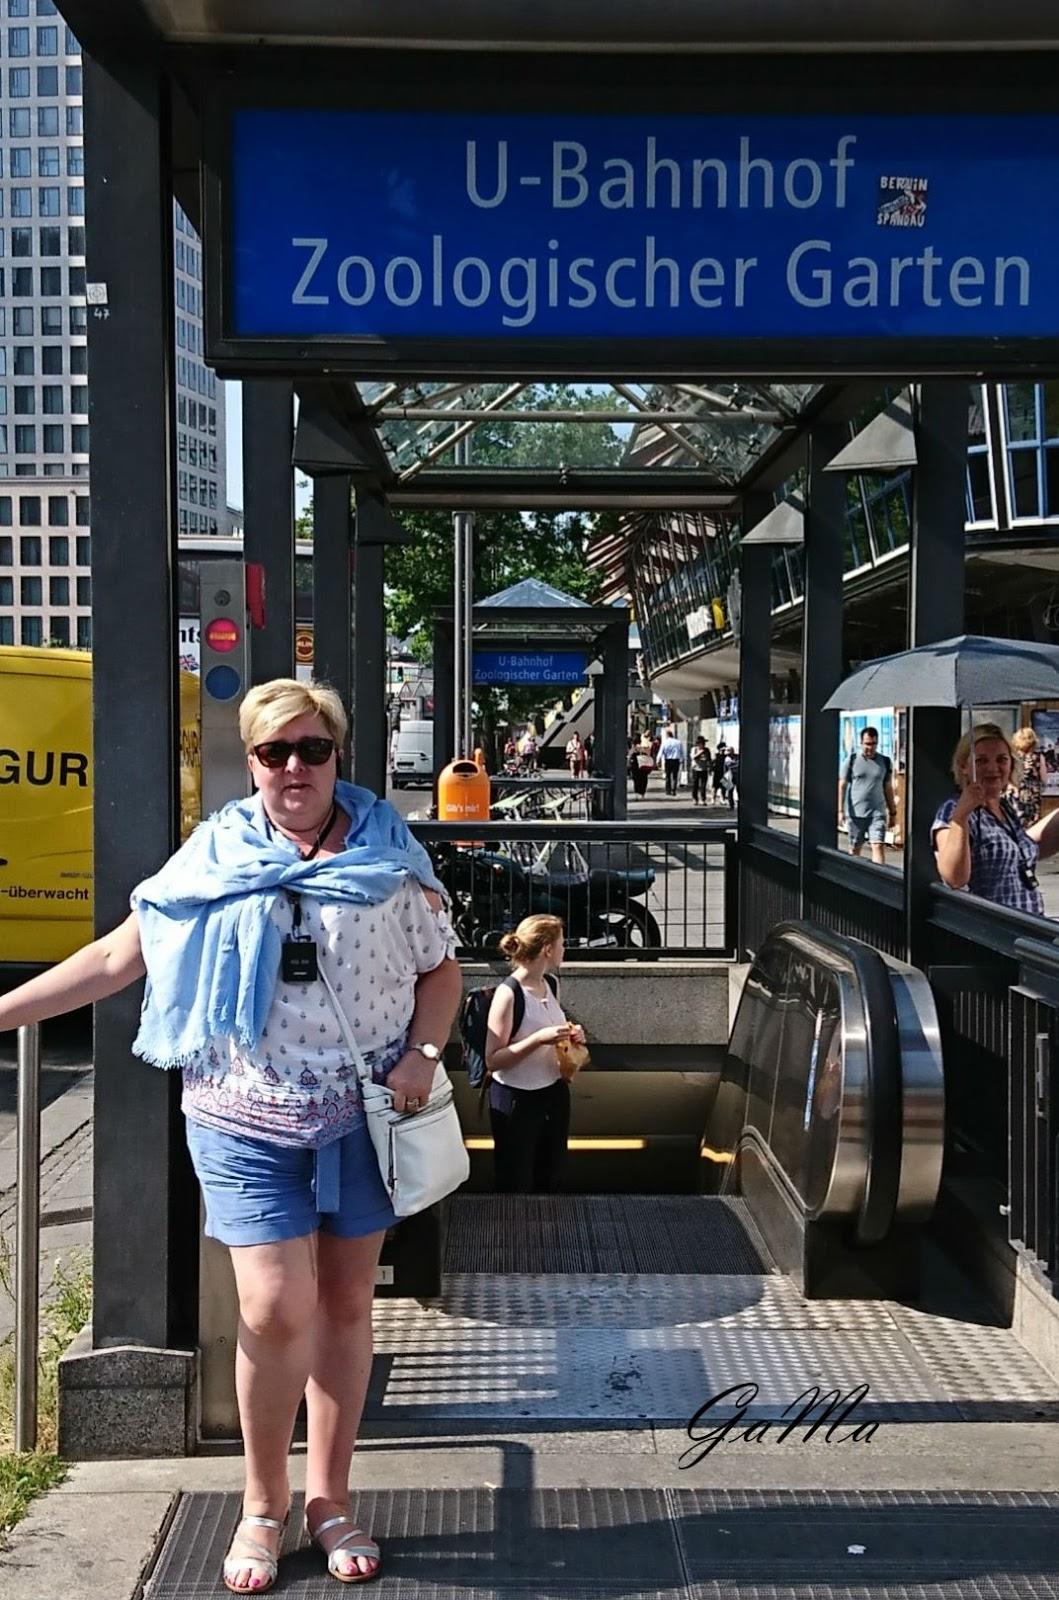 Bahnhof Zoologischer Garten Berlin Neu Zamotana Gama Berlin Część A